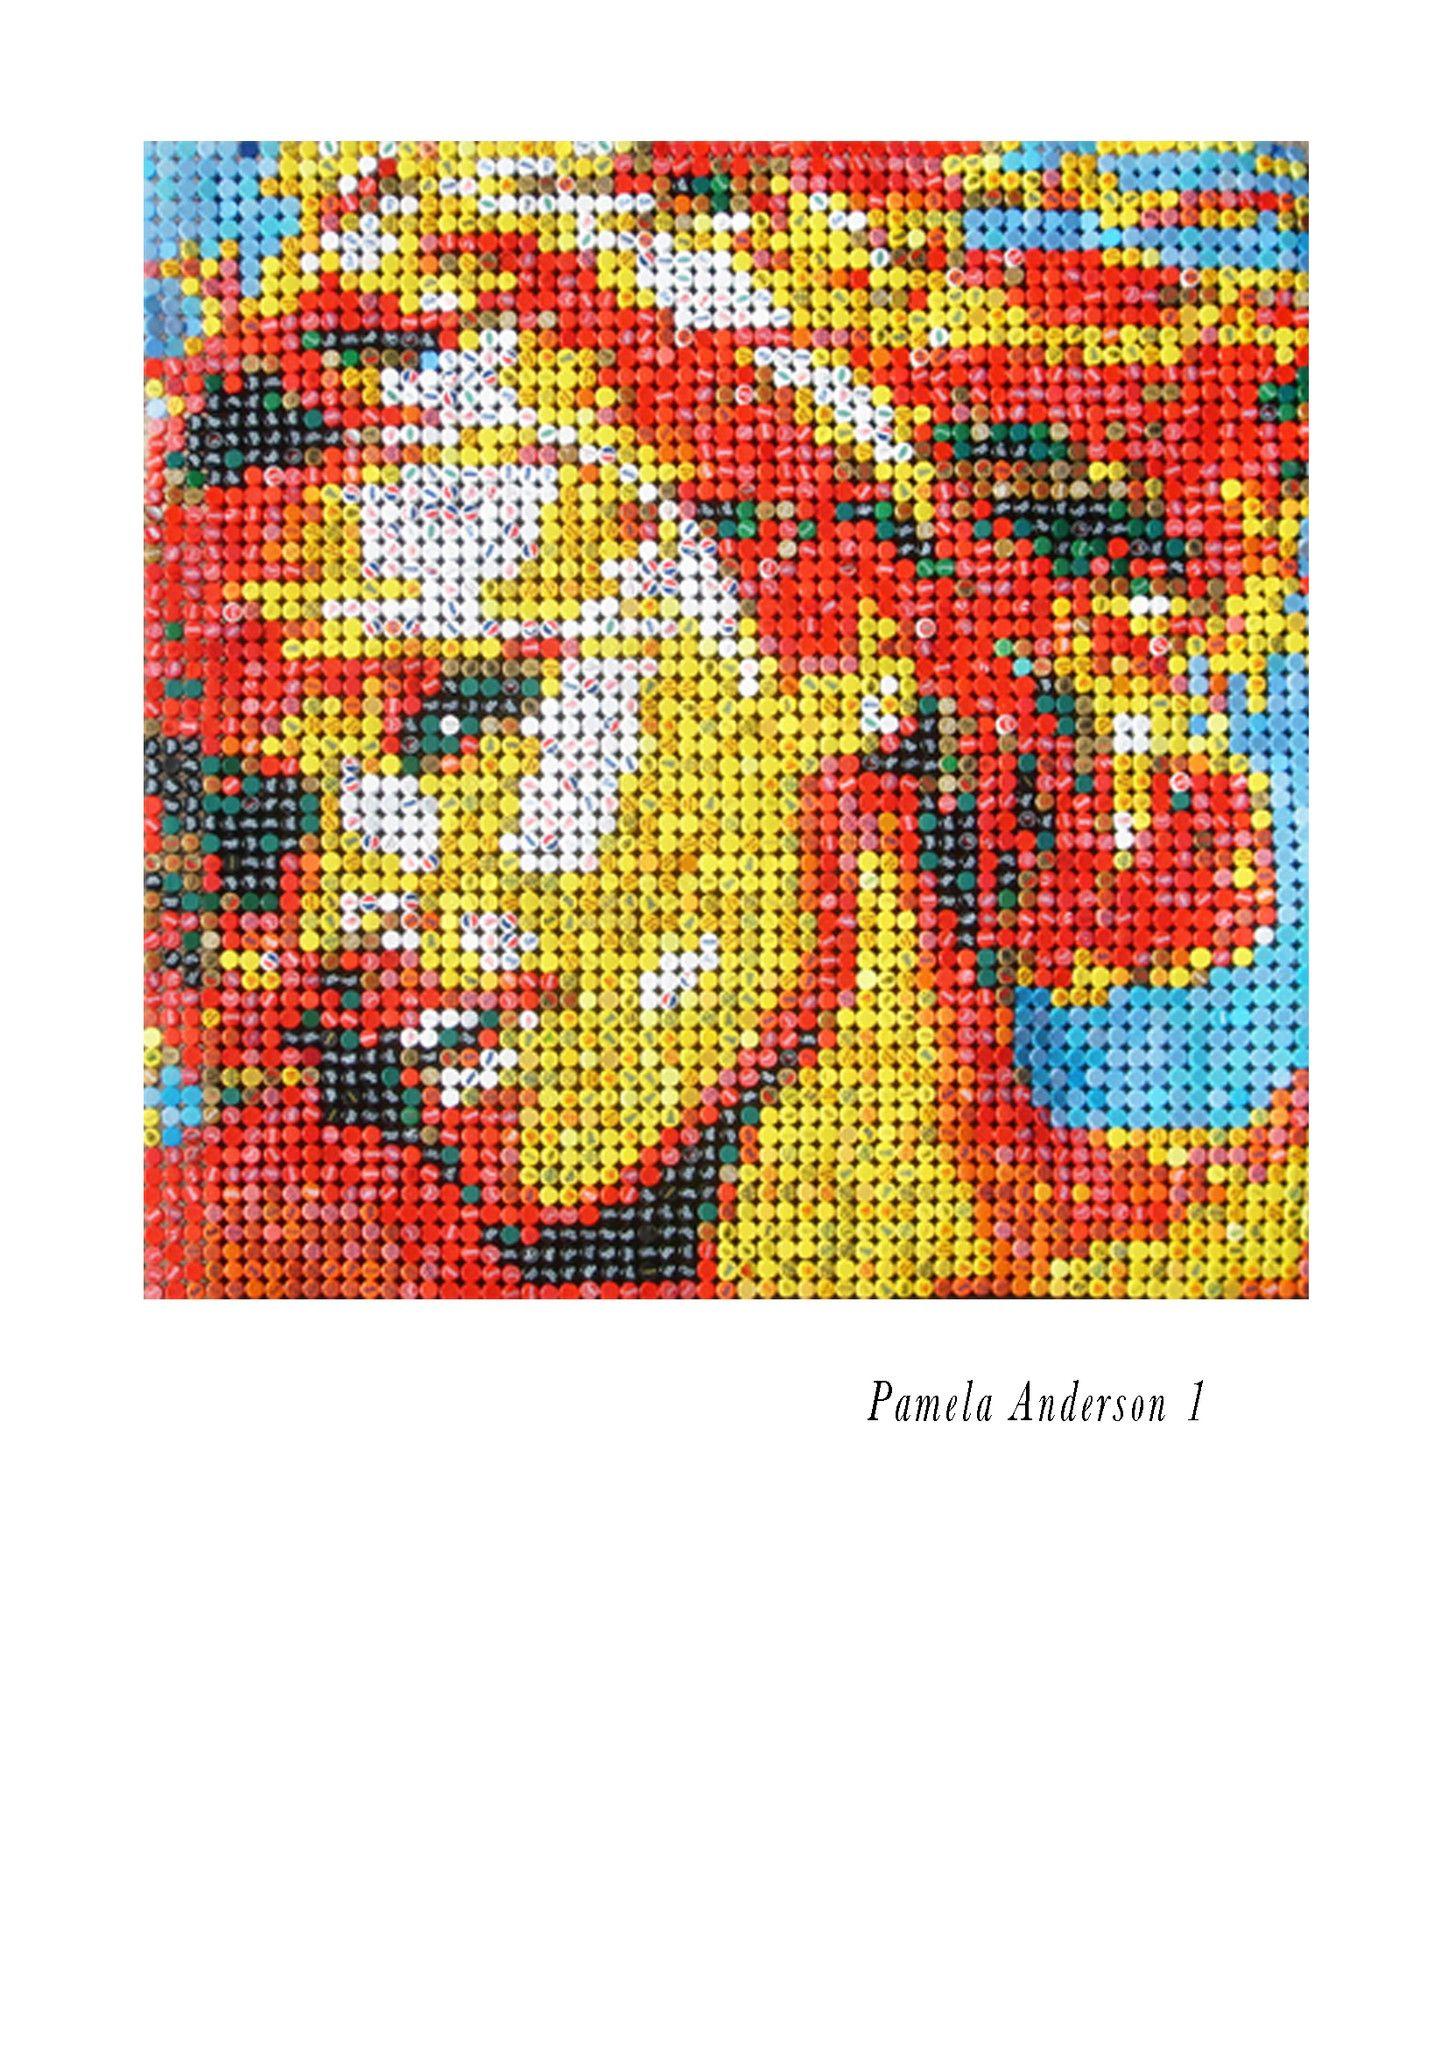 "MIXED MEDIA JORGE CASTRO GOMEZ "" PAM 1 ""  dimensioni L 150 x H 150 cm."